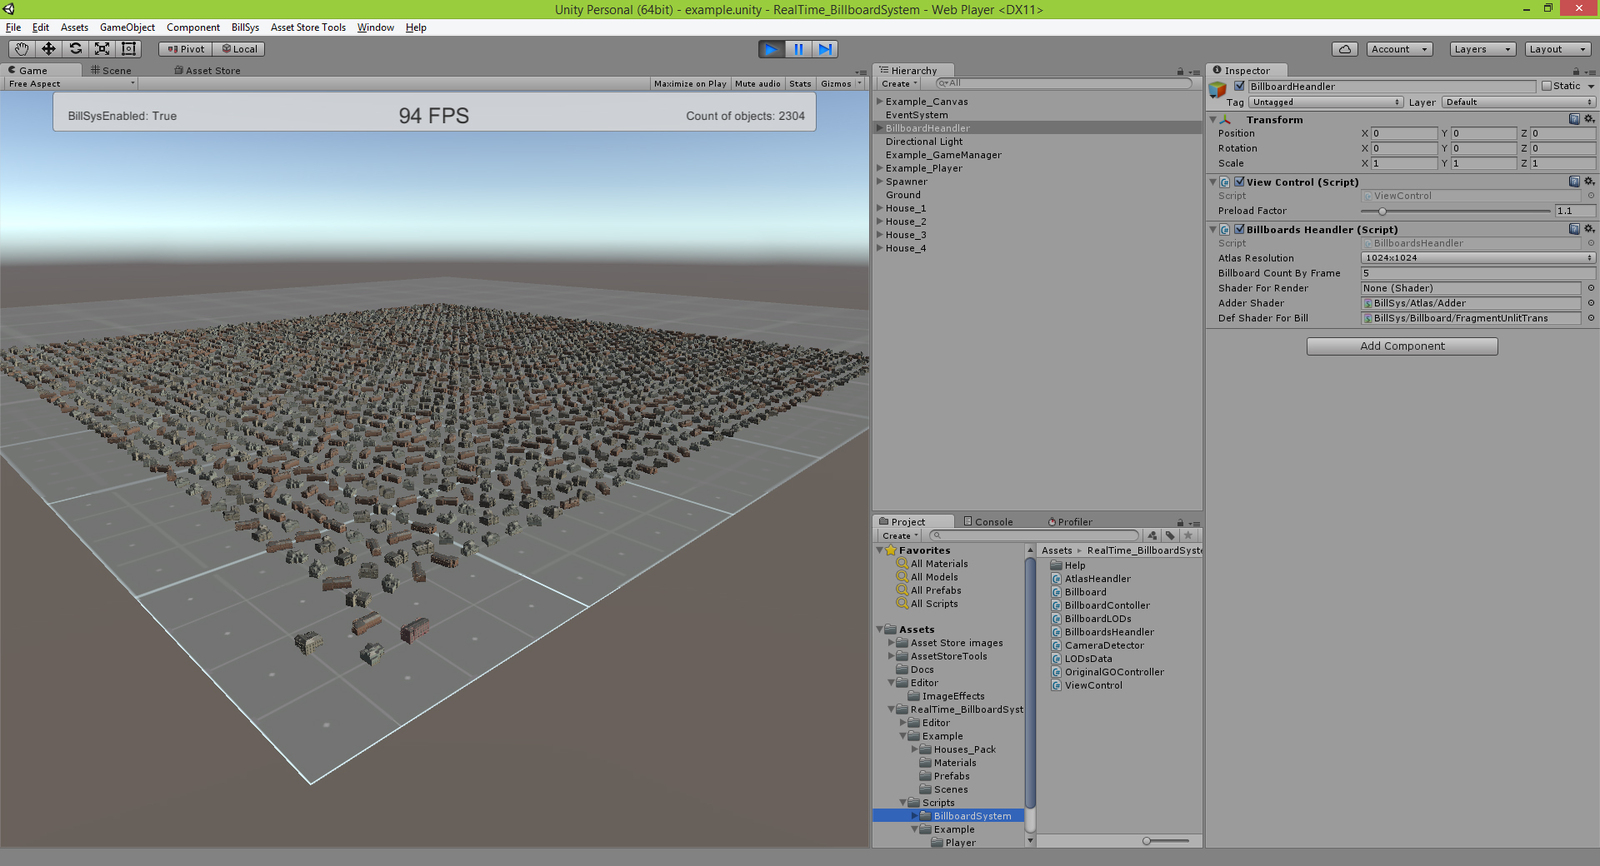 Unity 3D Asset Store - Мой проект  Realtime Billboard System